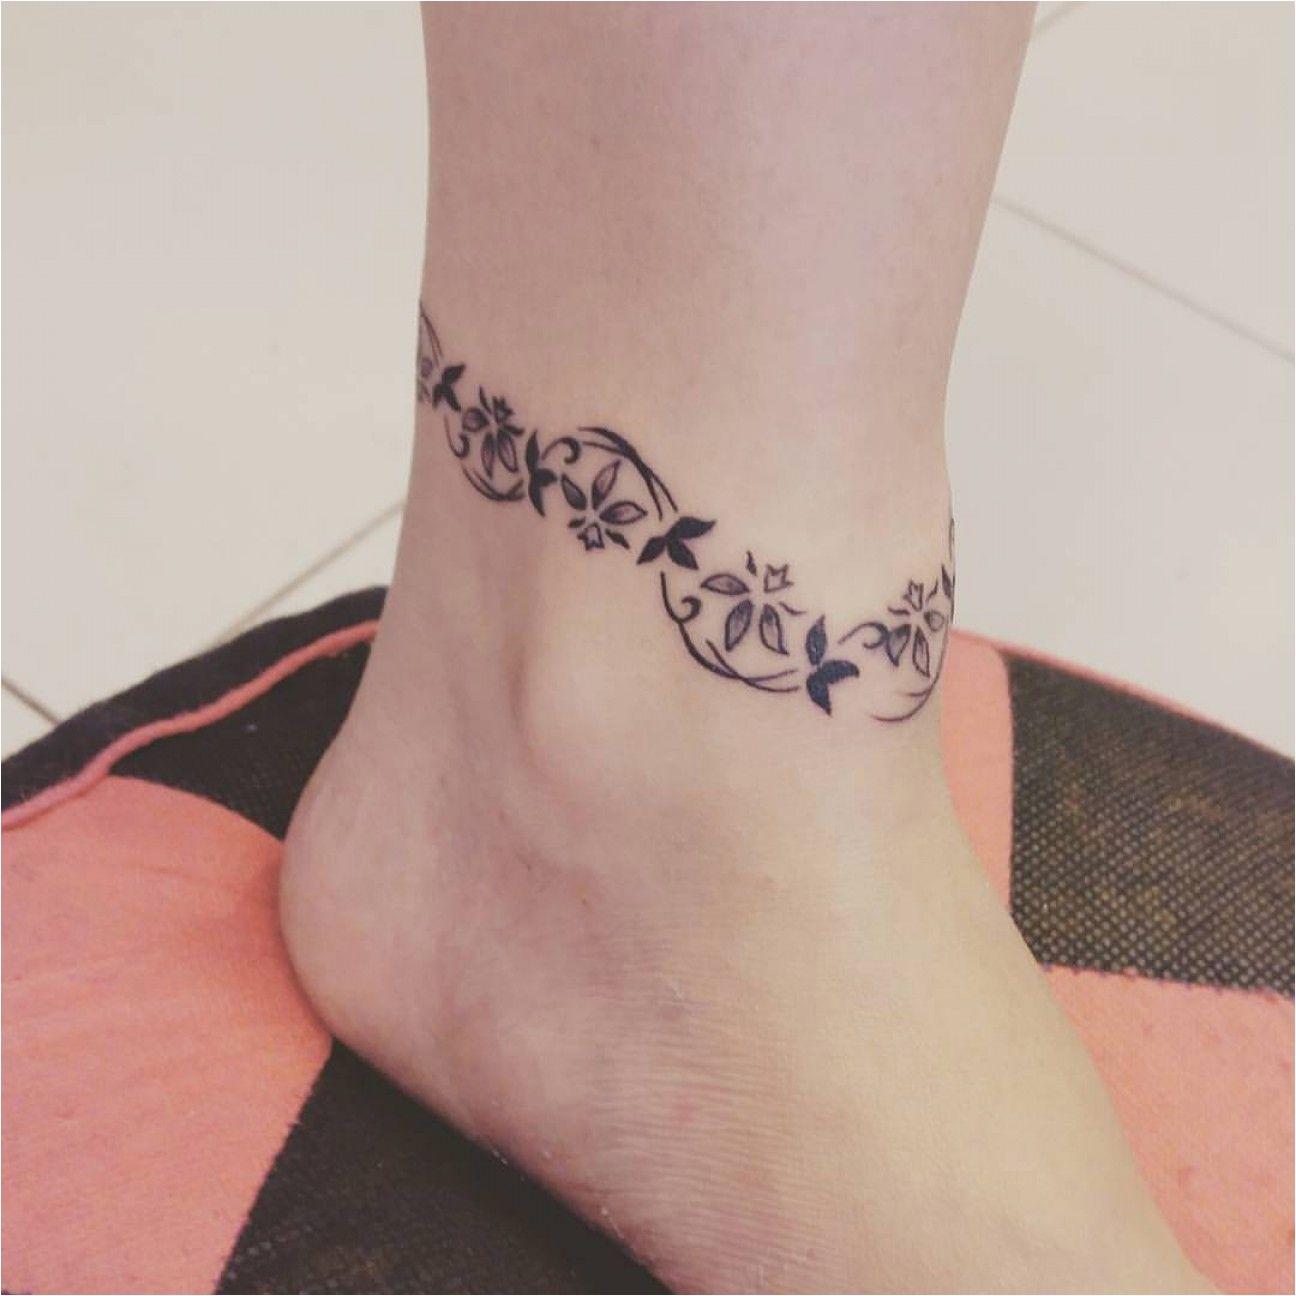 24 New Bracelet Tattoo Ideas 2019 Ankle Bracelet Tattoo Tattoo Bracelet Bracelet Tattoos With Names